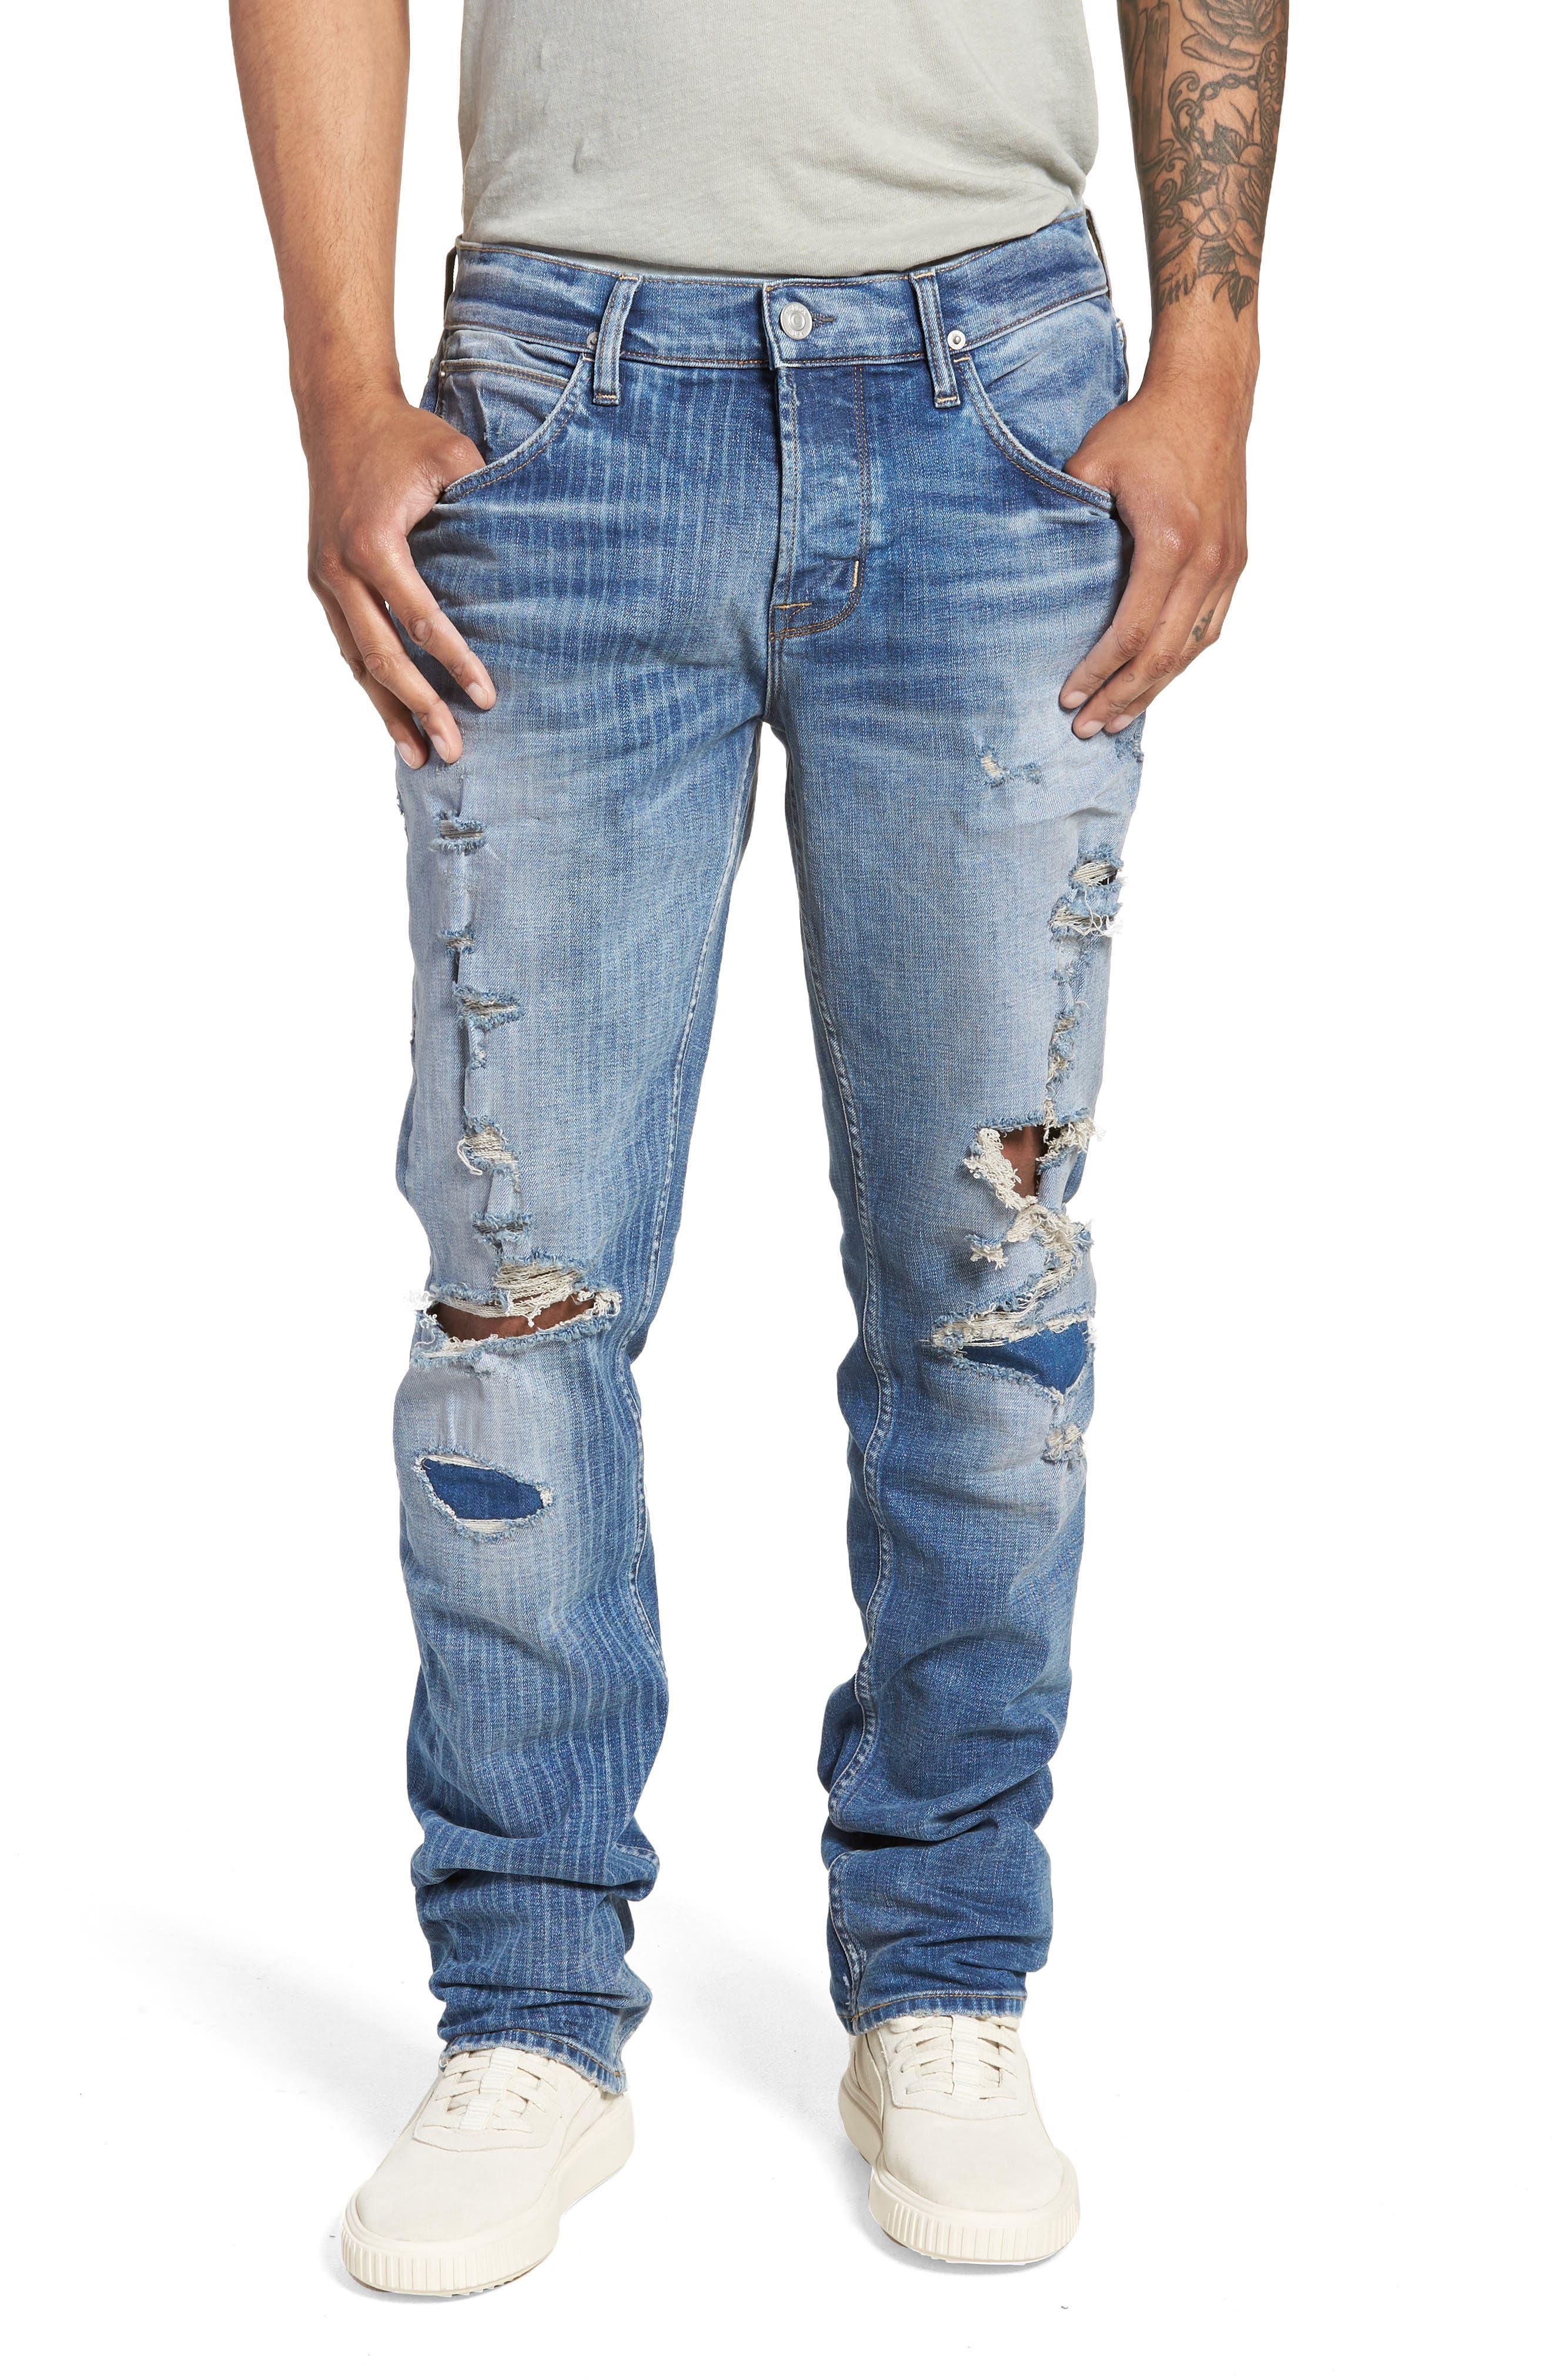 Blake Slim Fit Jeans,                         Main,                         color, Eagle Rock